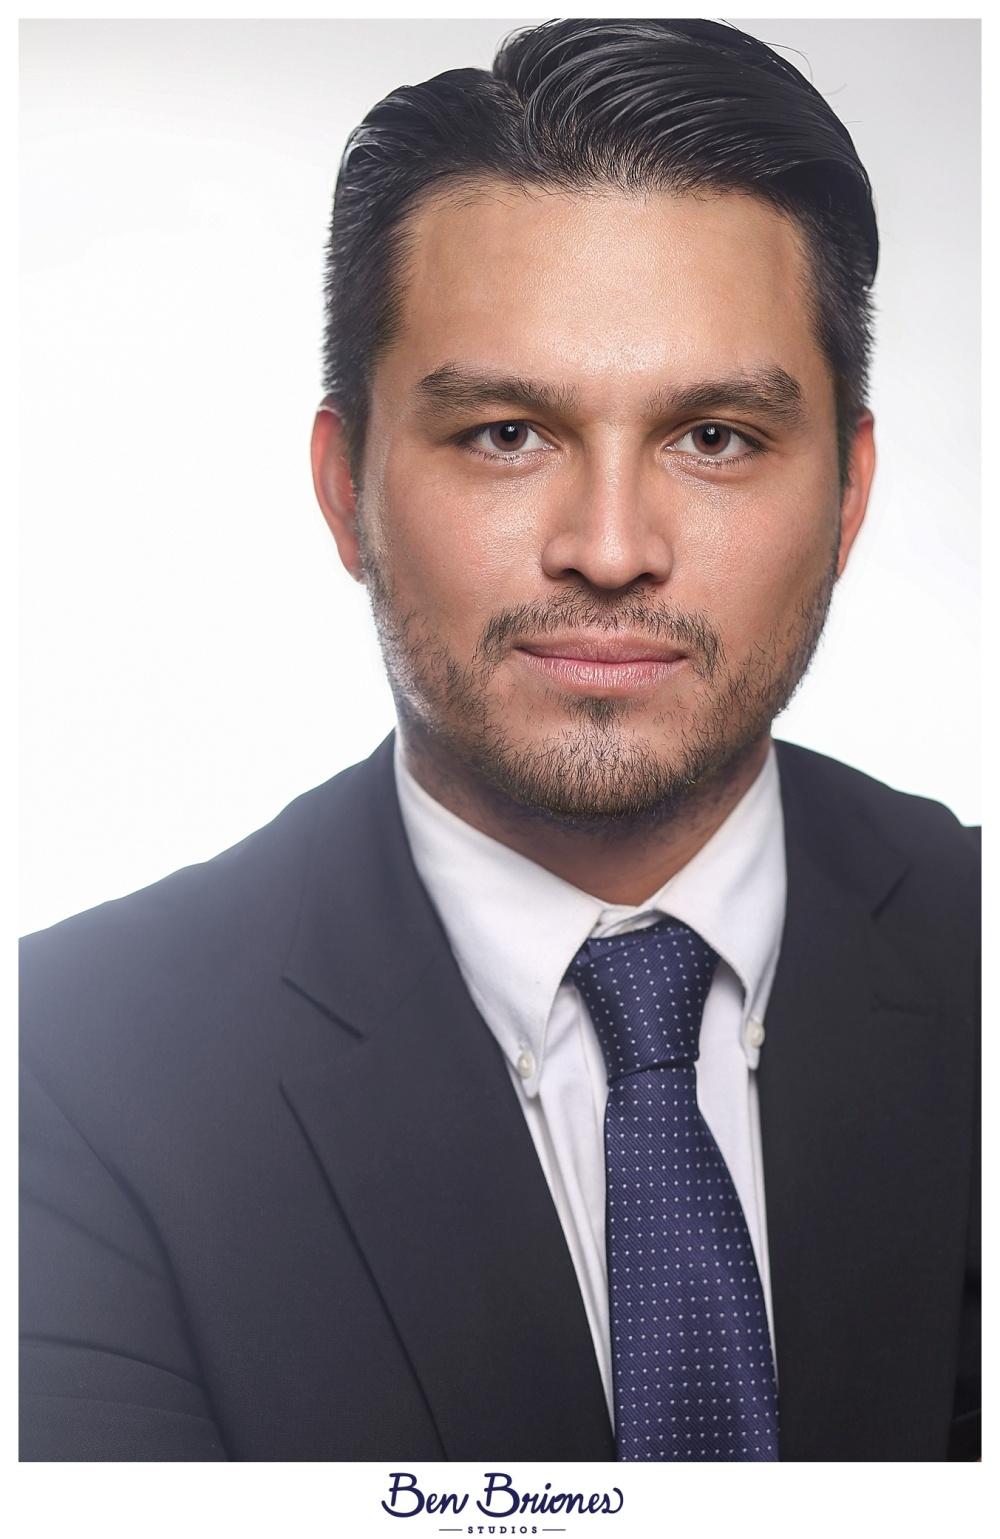 Ignacio Mendoza Head Shots_HighRes_BBS-6330_pp_WEB